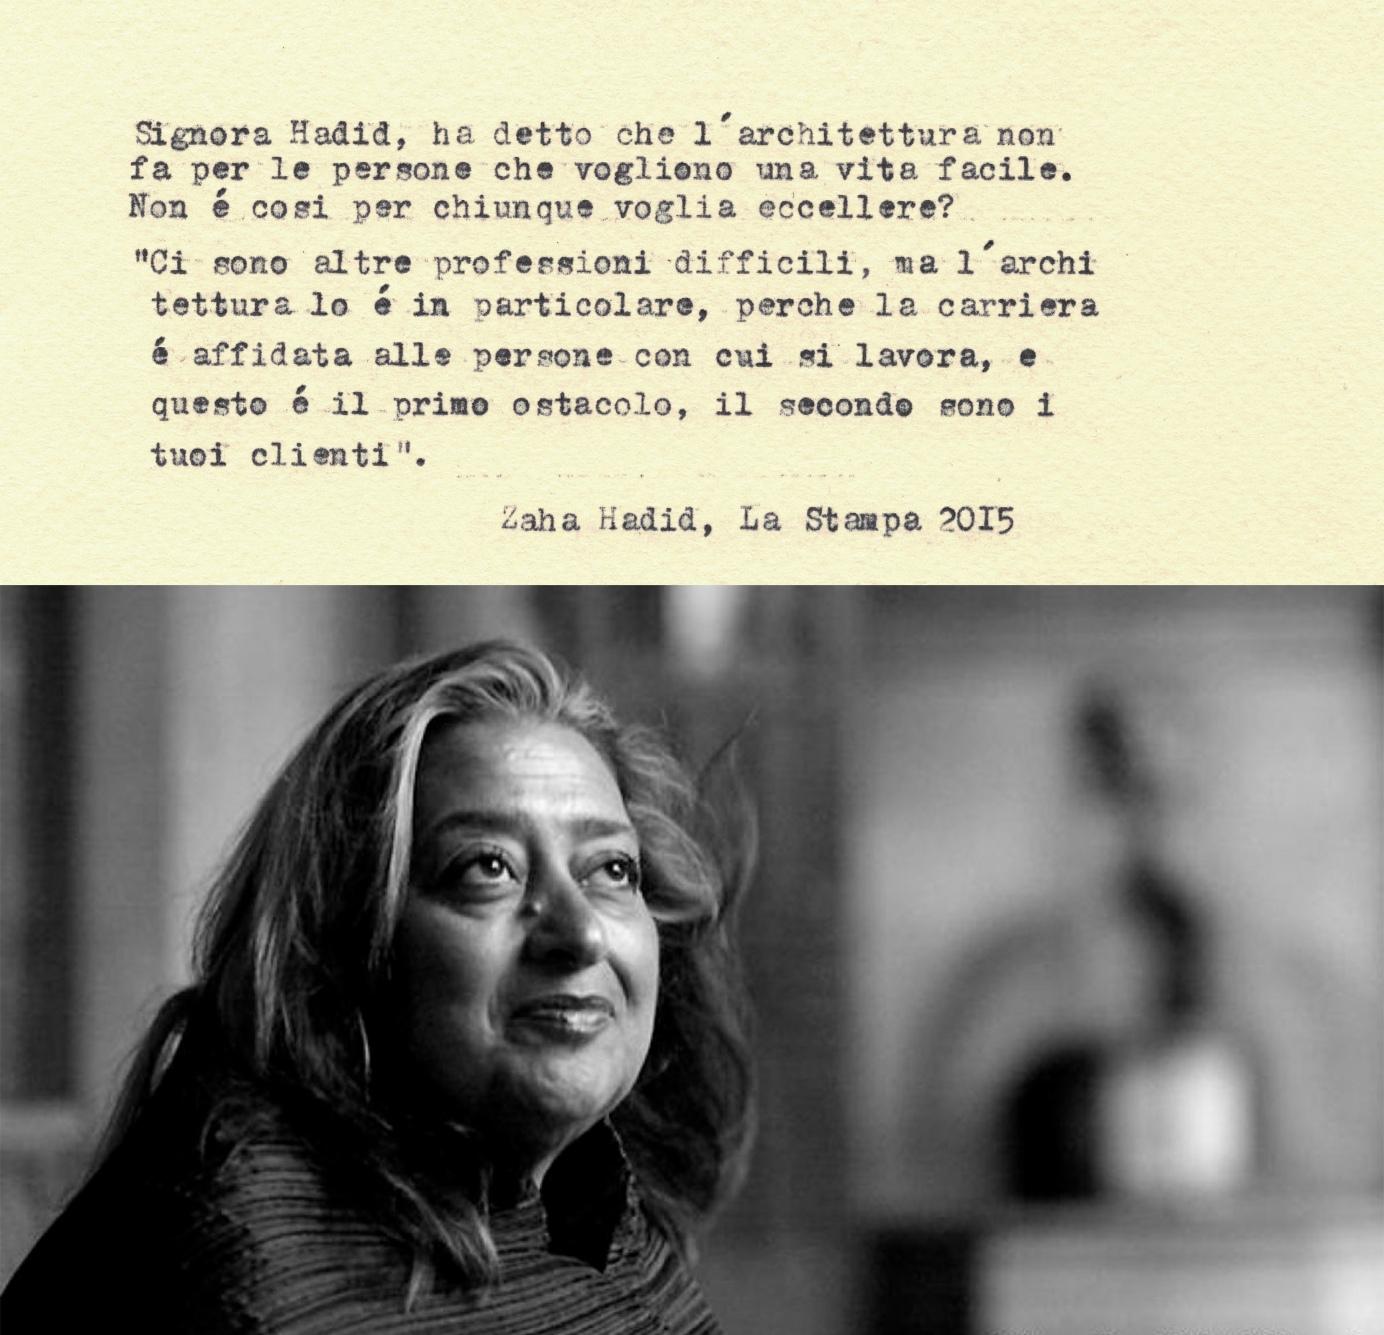 Cit. Zaha Hadid 01.jpg